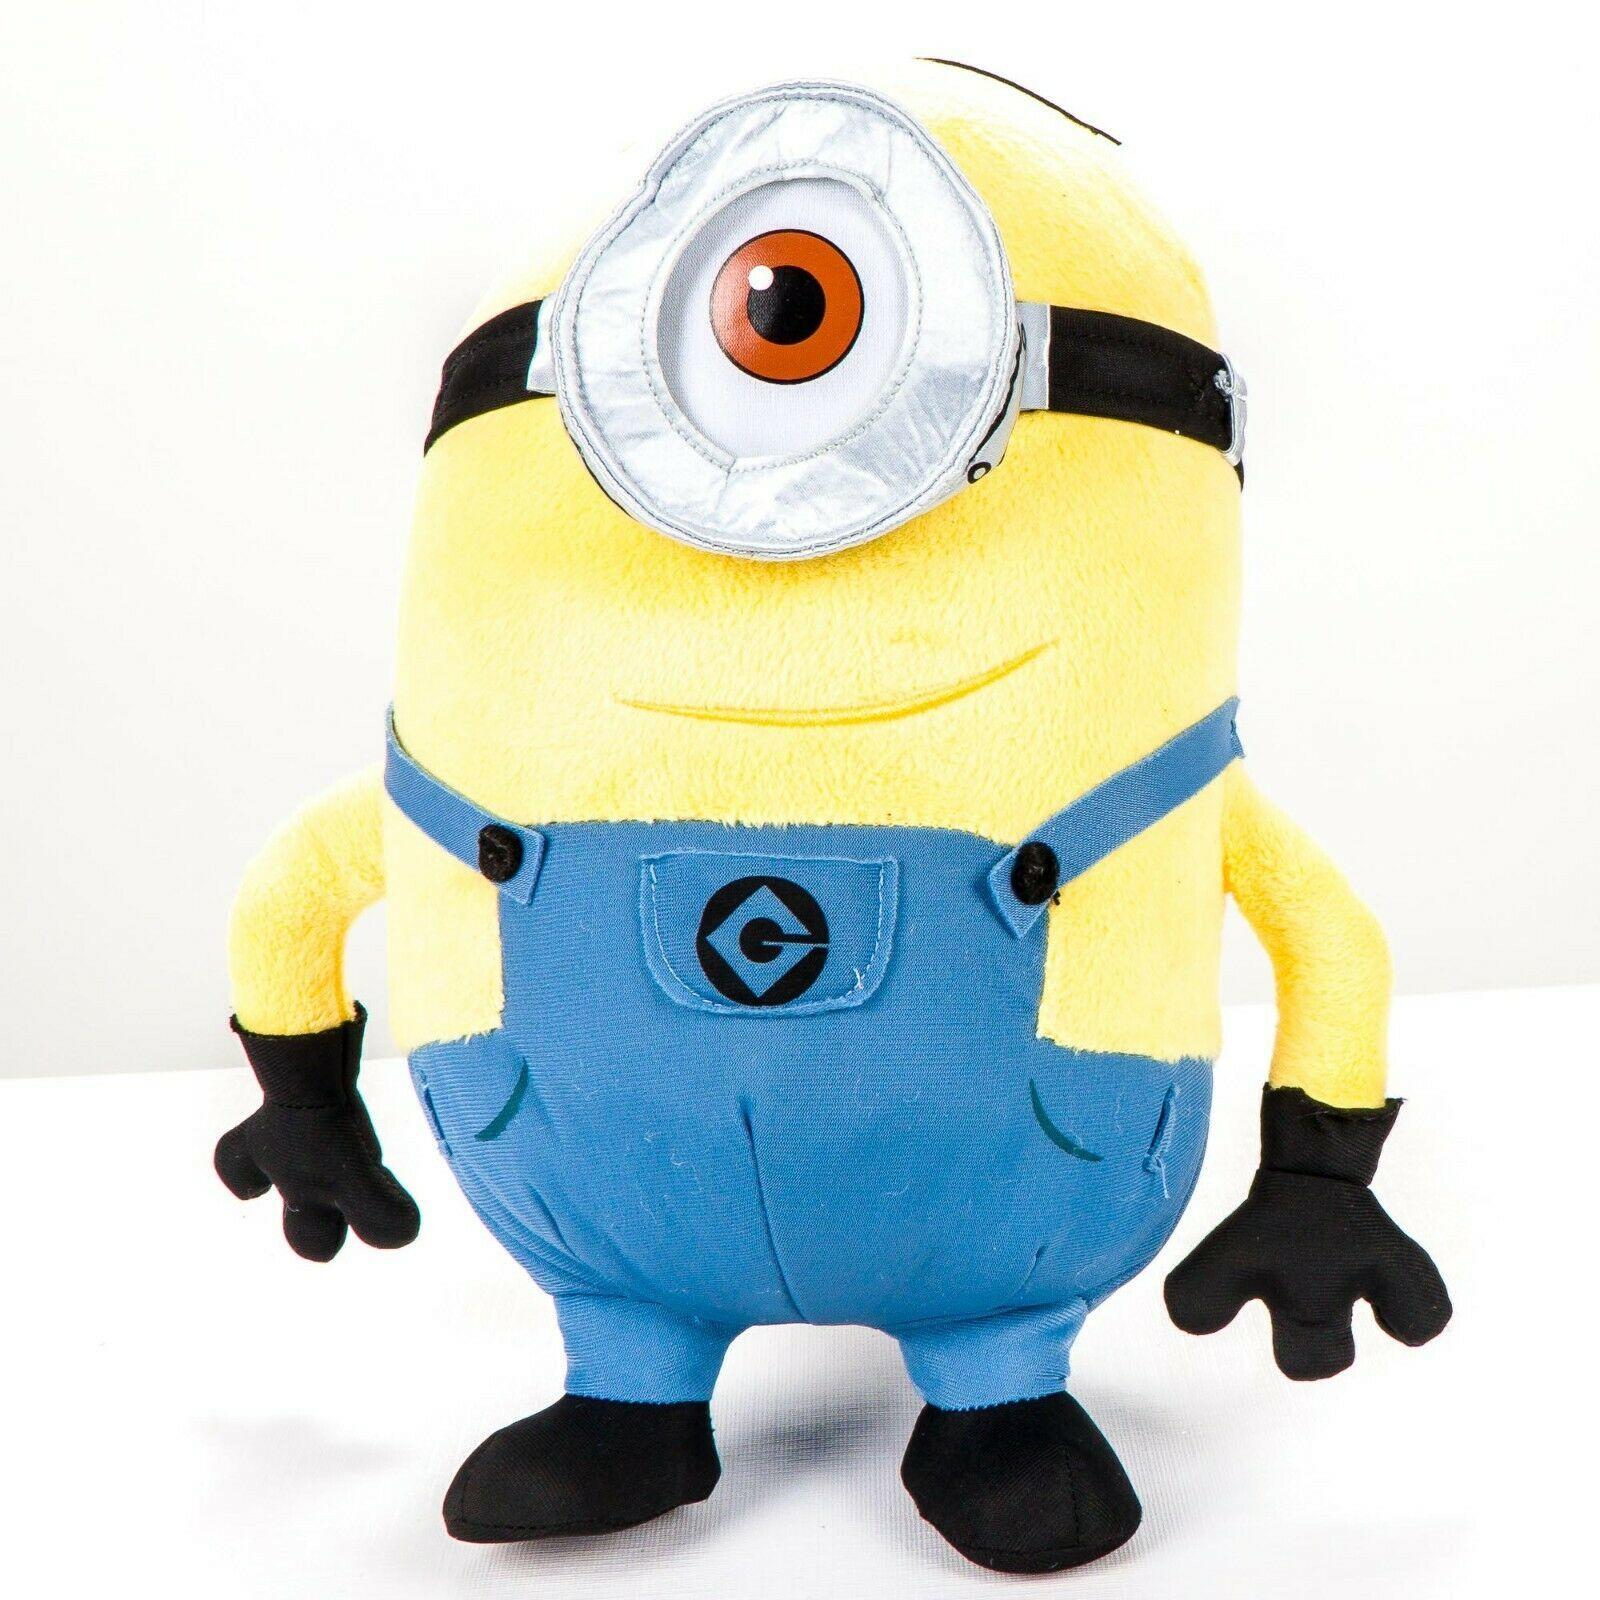 "Despicable Me Minion Stuart Plush 12"" Mayhem Universal Studios One Eye Goggles - $21.64"